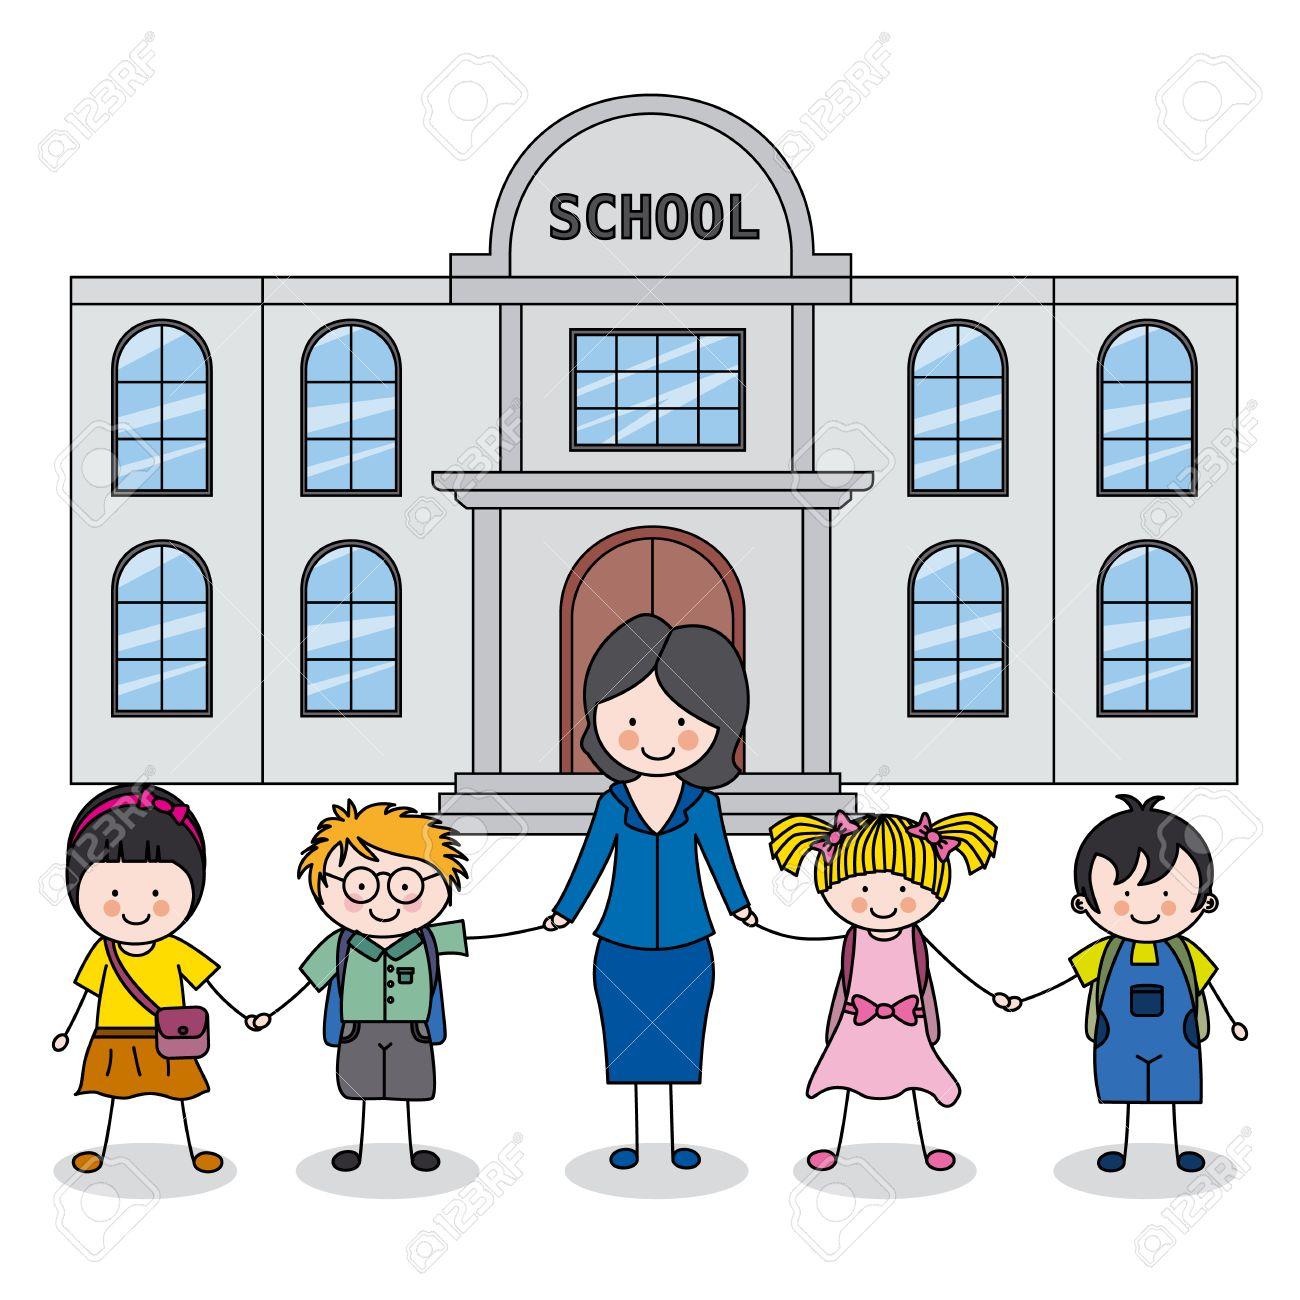 children and teacher in front of the school.